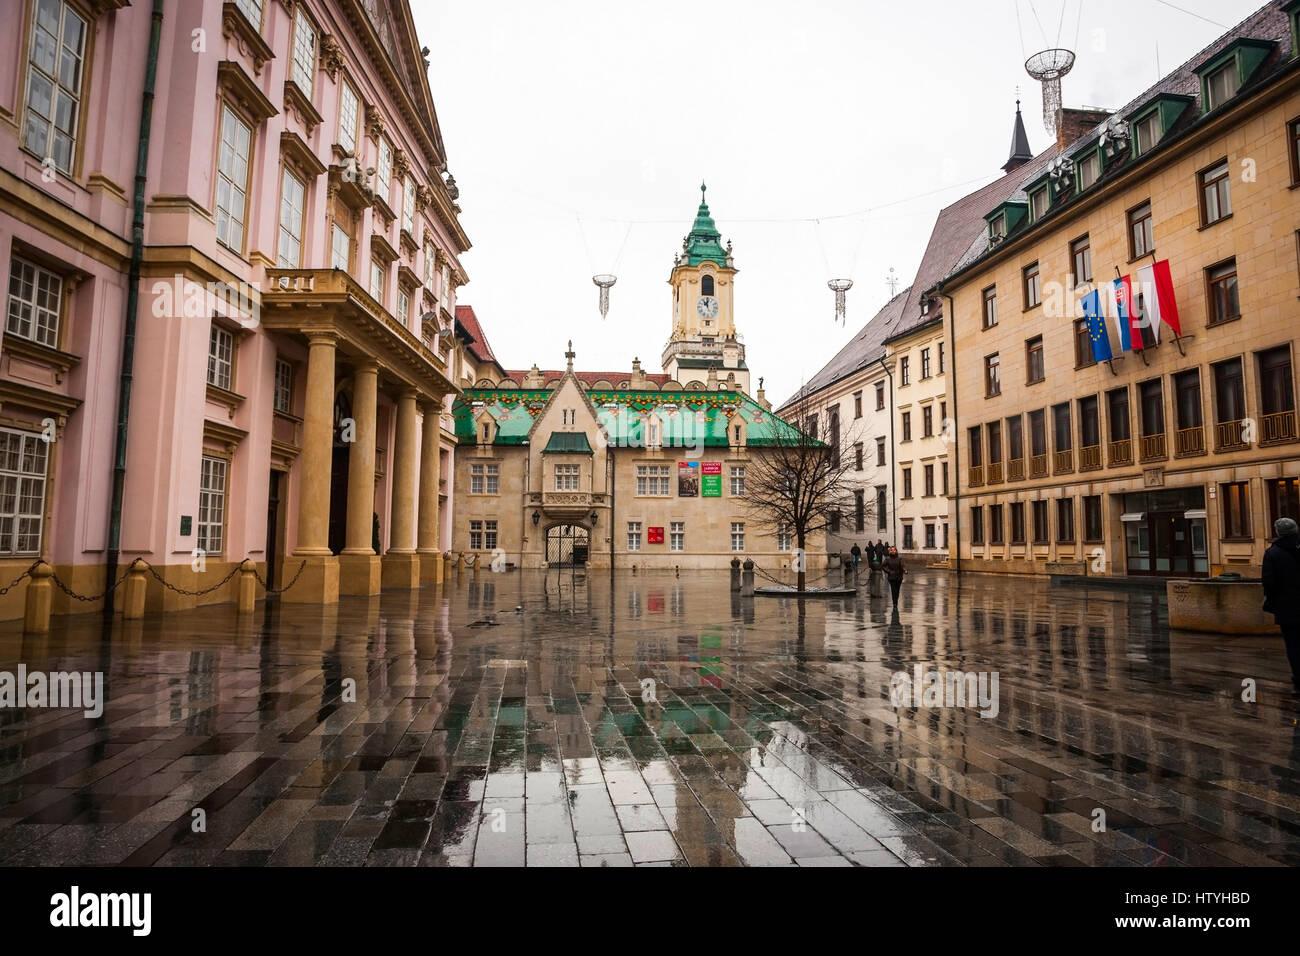 city hall bratislava slovakia europe stockfotos city. Black Bedroom Furniture Sets. Home Design Ideas